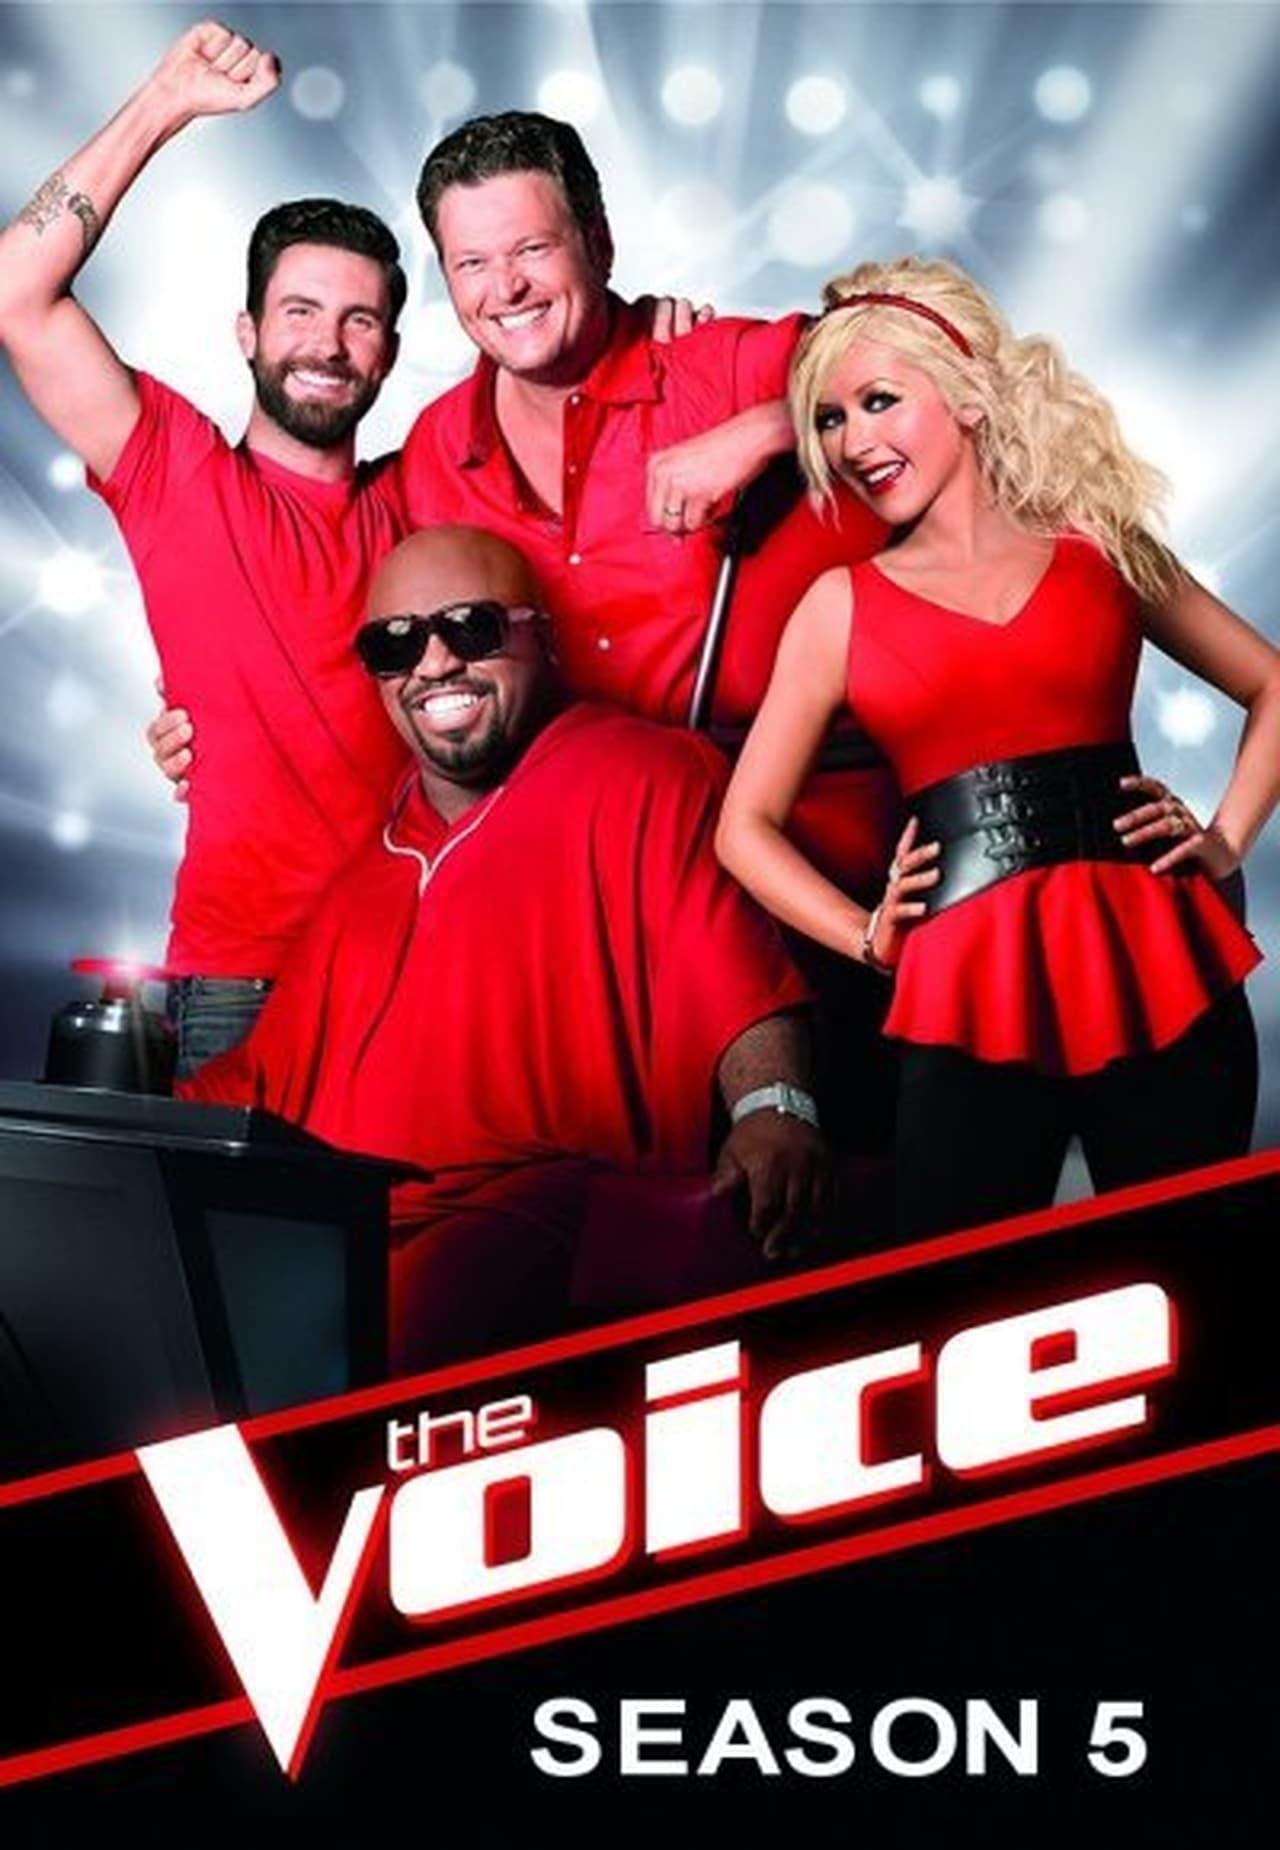 Watch The Voice Season 5 Online